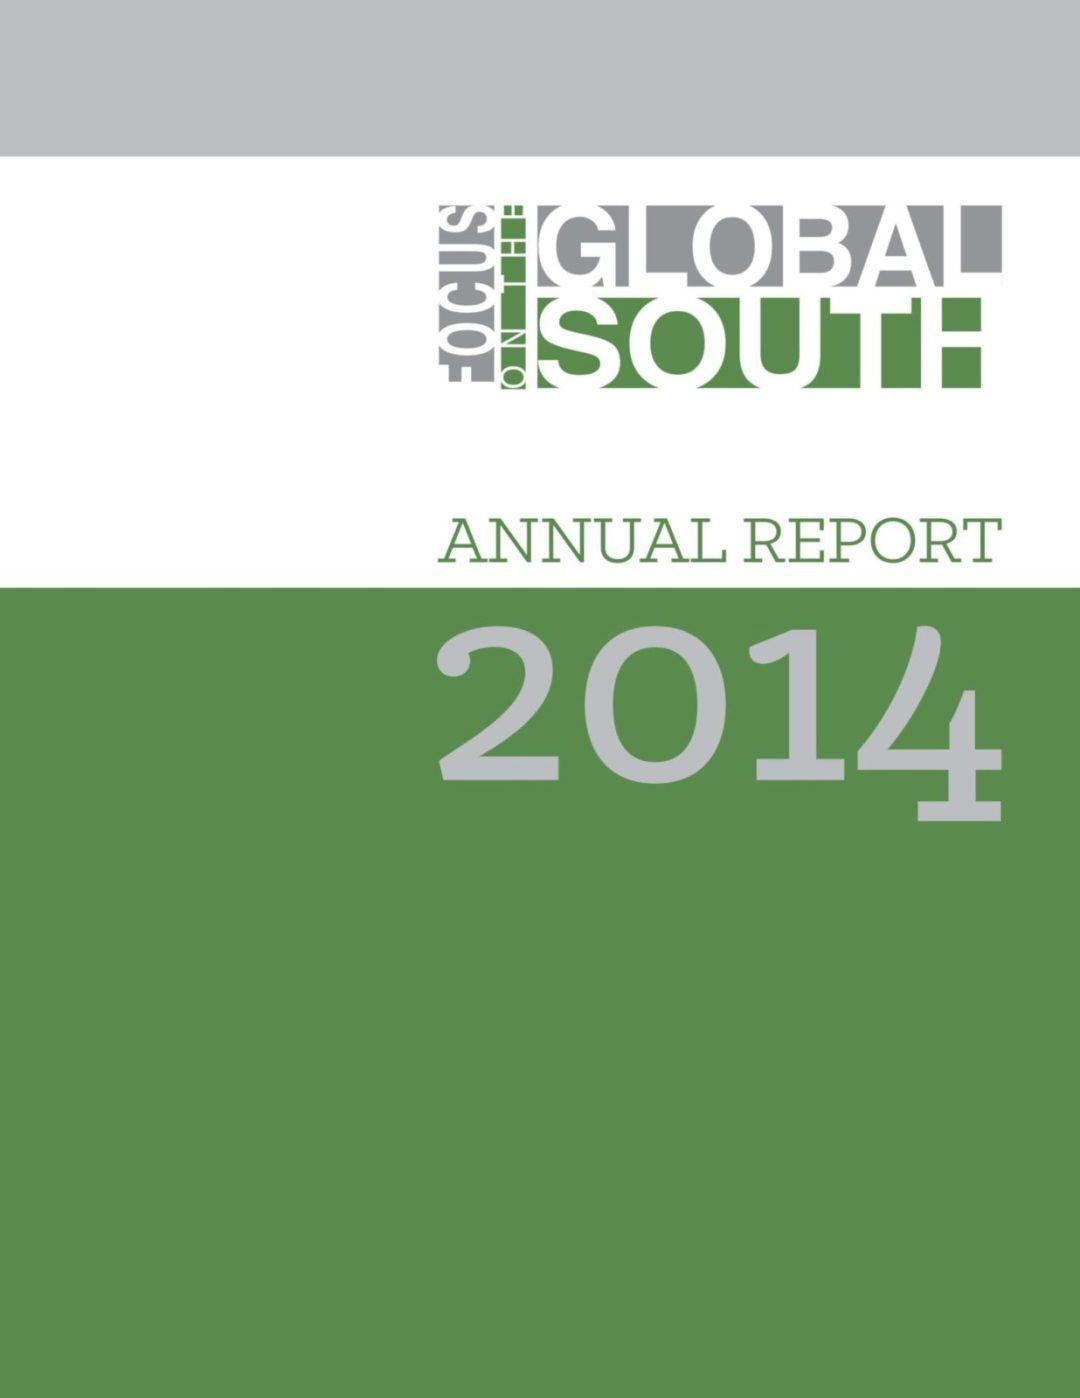 Annual Report Cover 2014